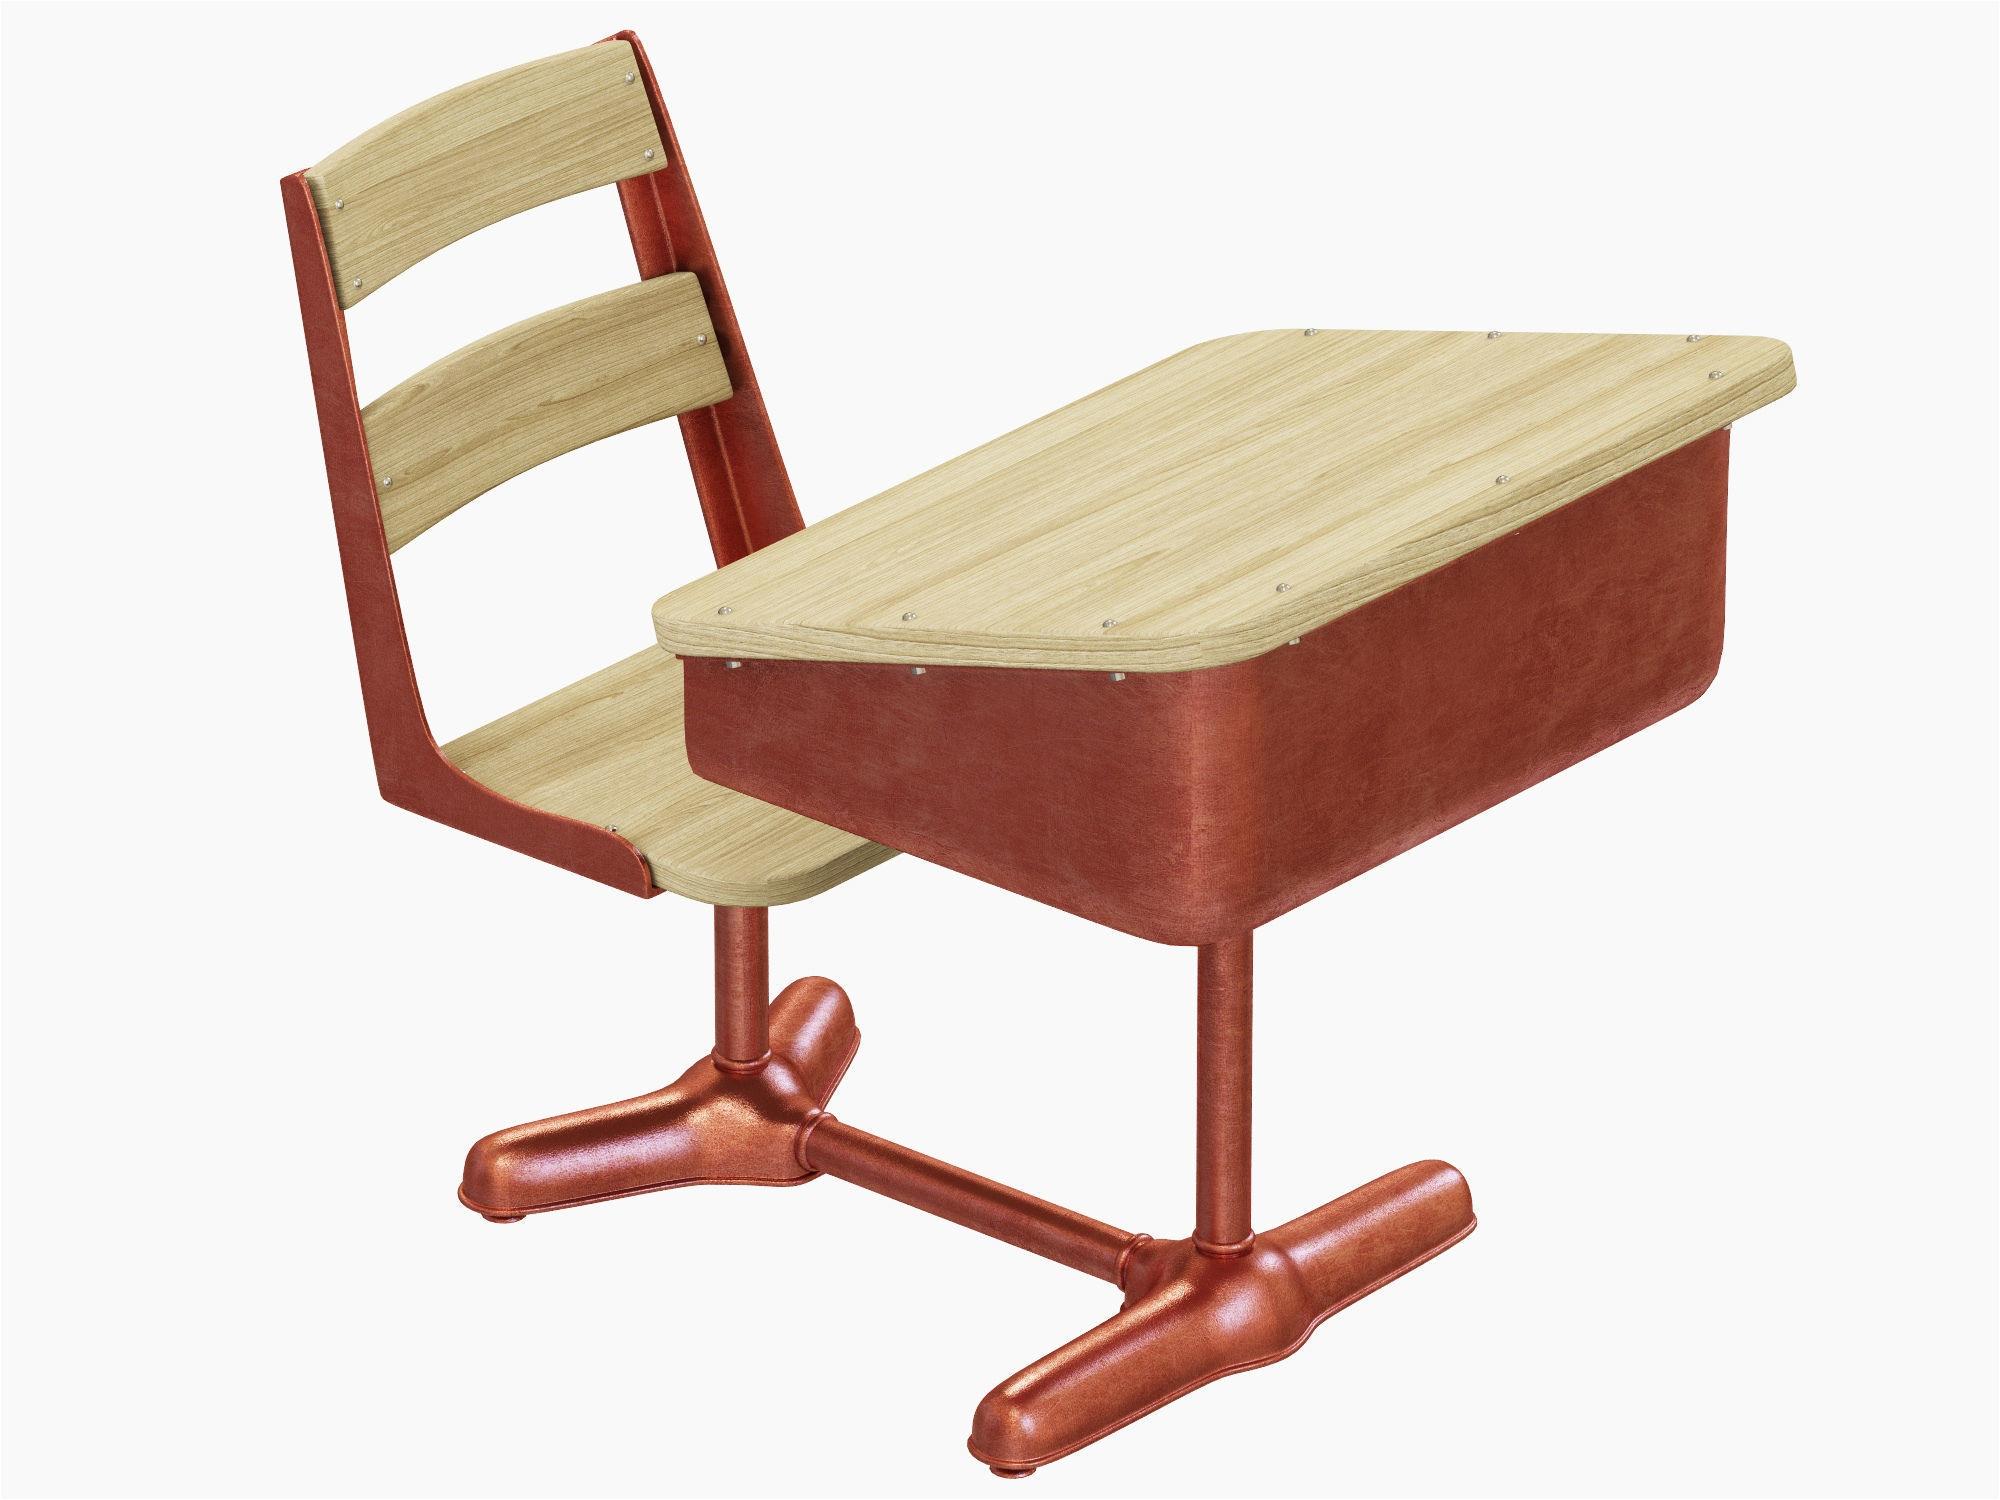 Restoration Hardware Professor S Chair 30 Luxury Restoration Hardware Metal Chair Design Concept Of